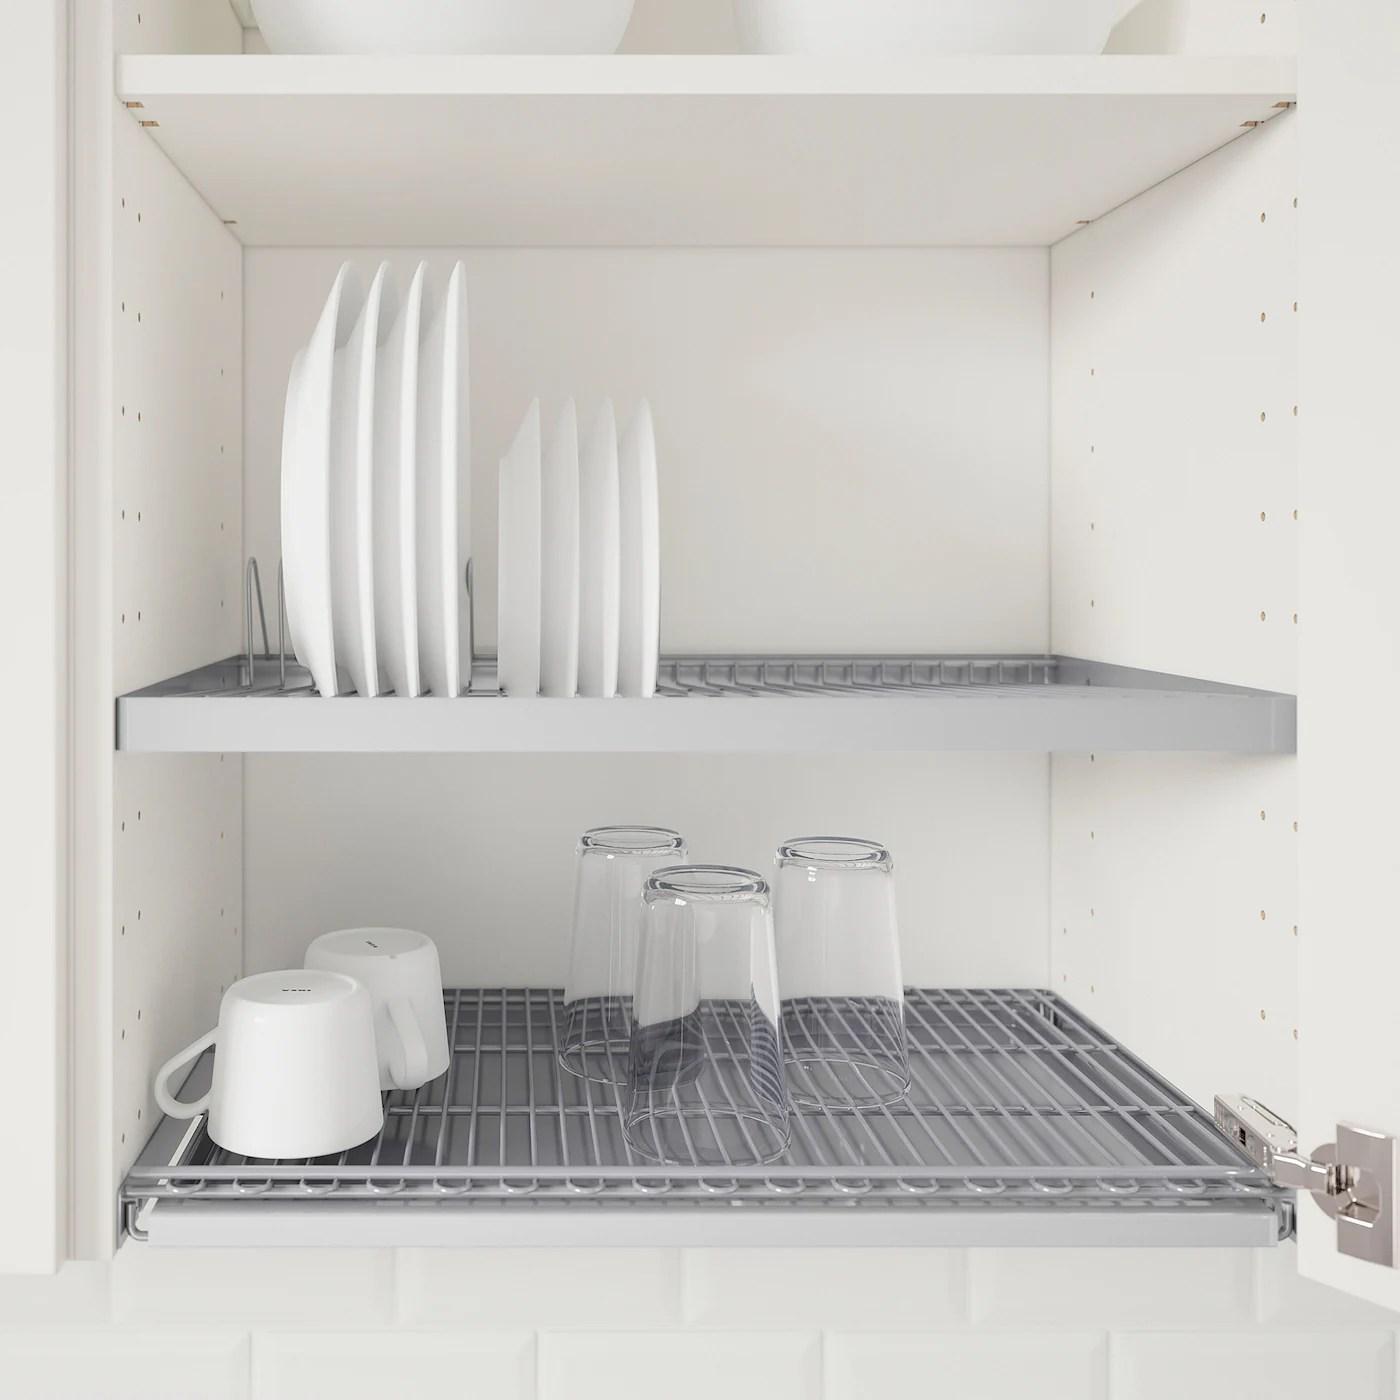 utrusta dish drainer for wall cabinet 60x35 cm